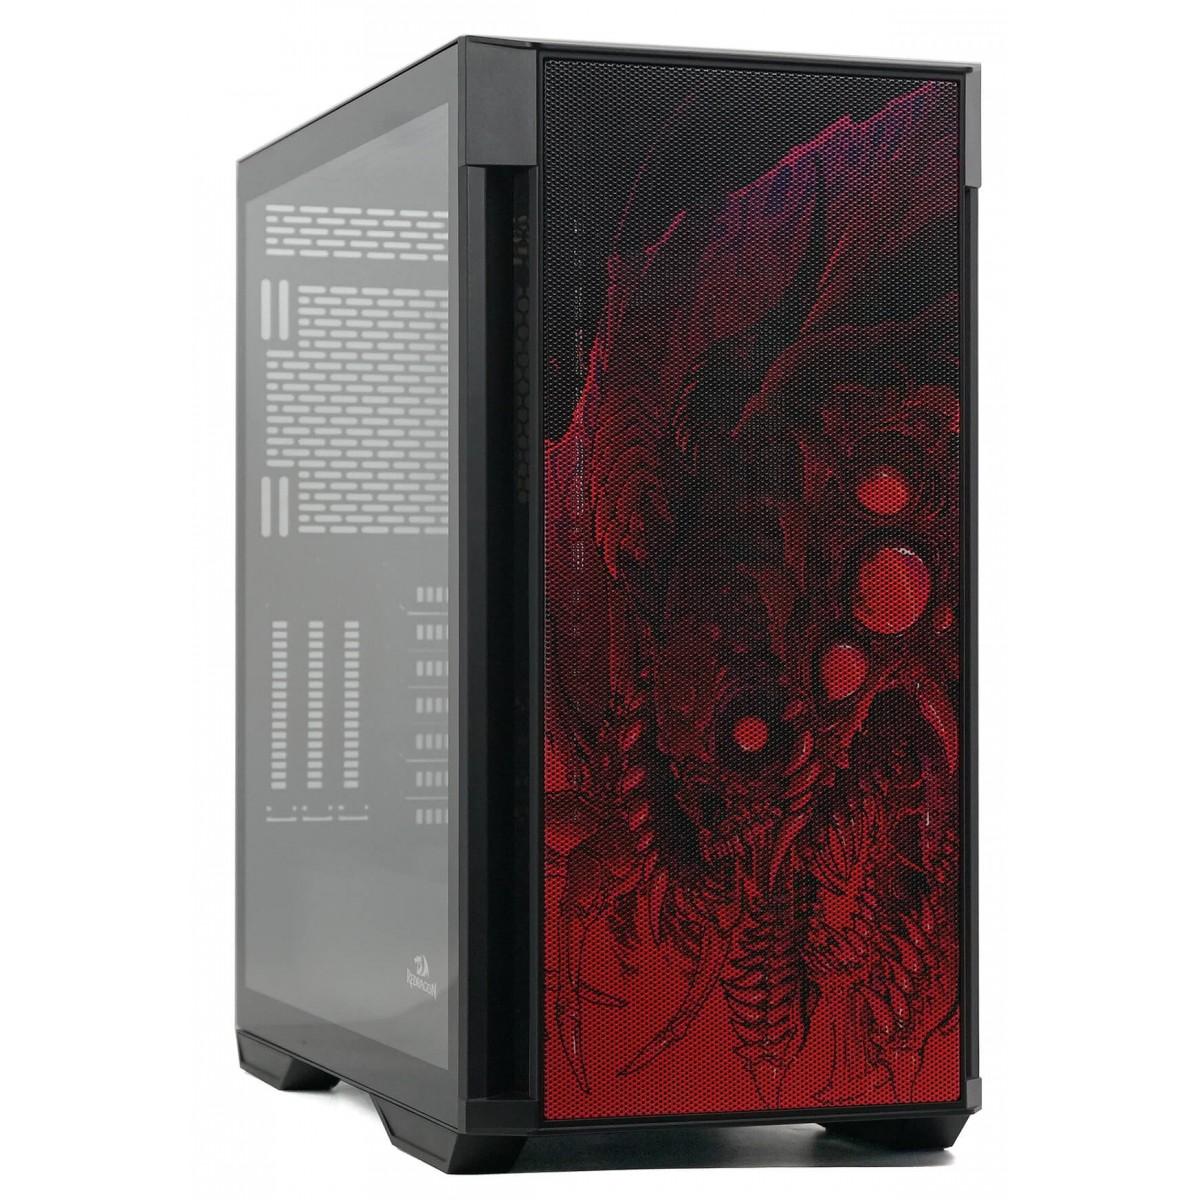 Gabinete Gamer Redragon Strafe Infernal Dragon, Mid Tower, Vidro Temperado, Black, ATX, Sem Fonte, Sem Fan, GC-706IF